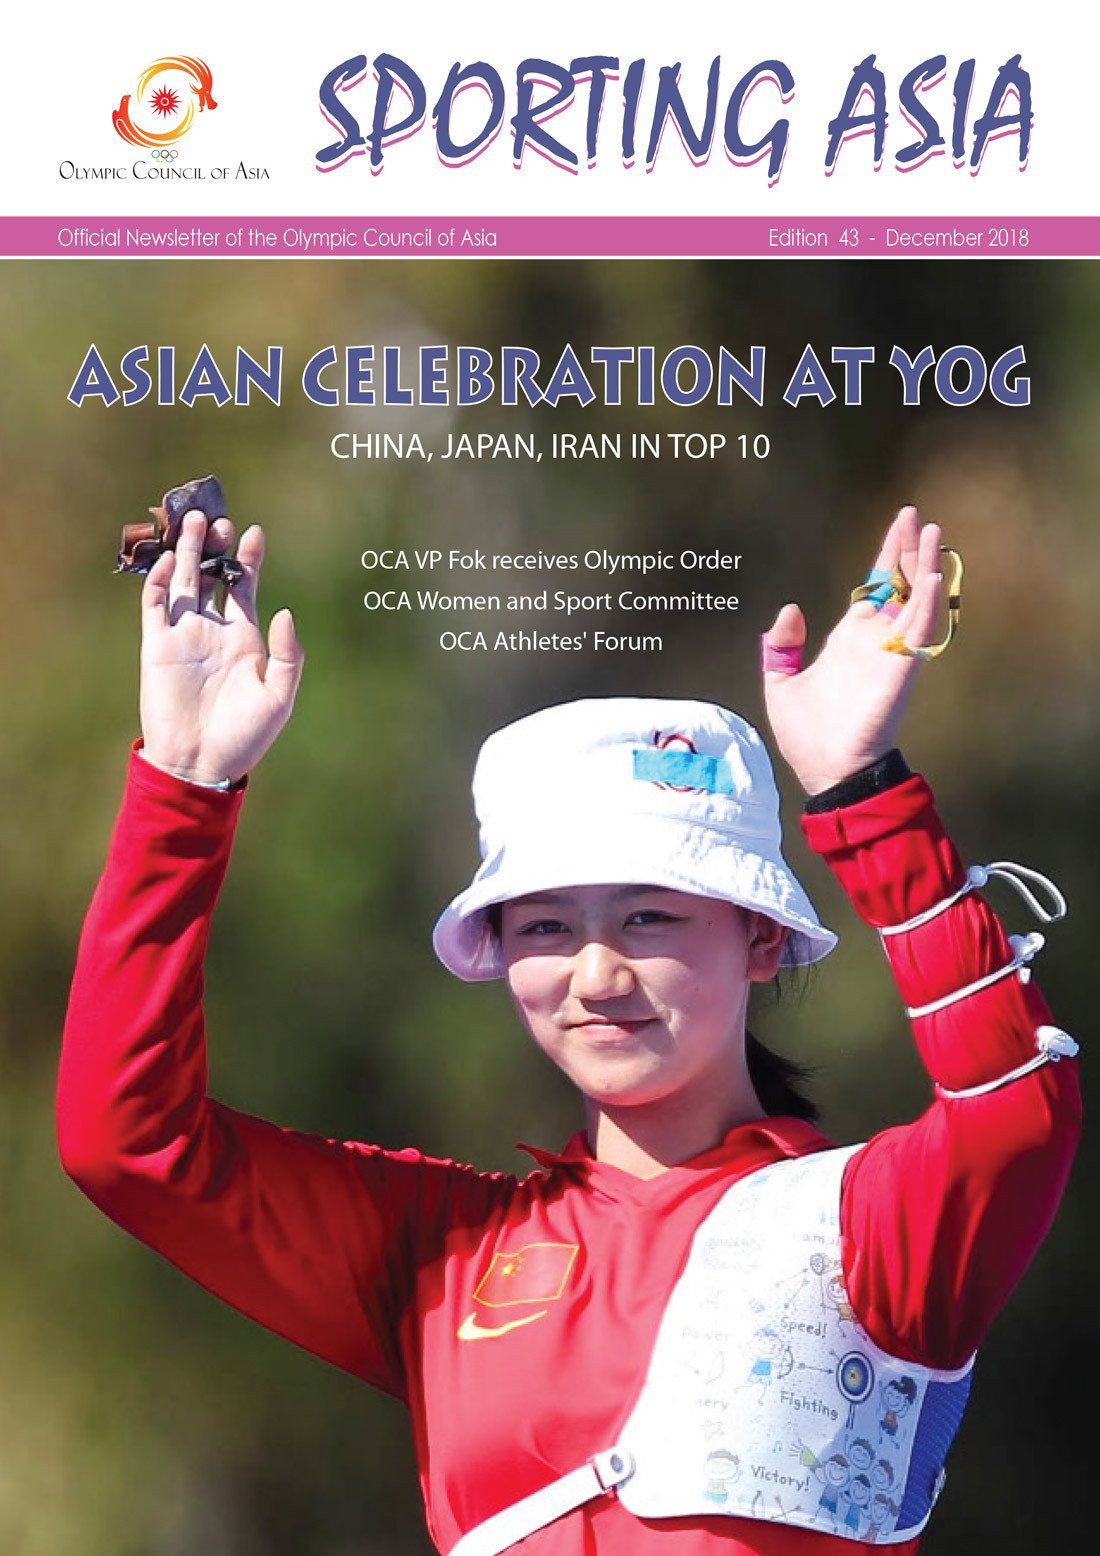 Sporting Asia - Edition 43 - DEC 2018